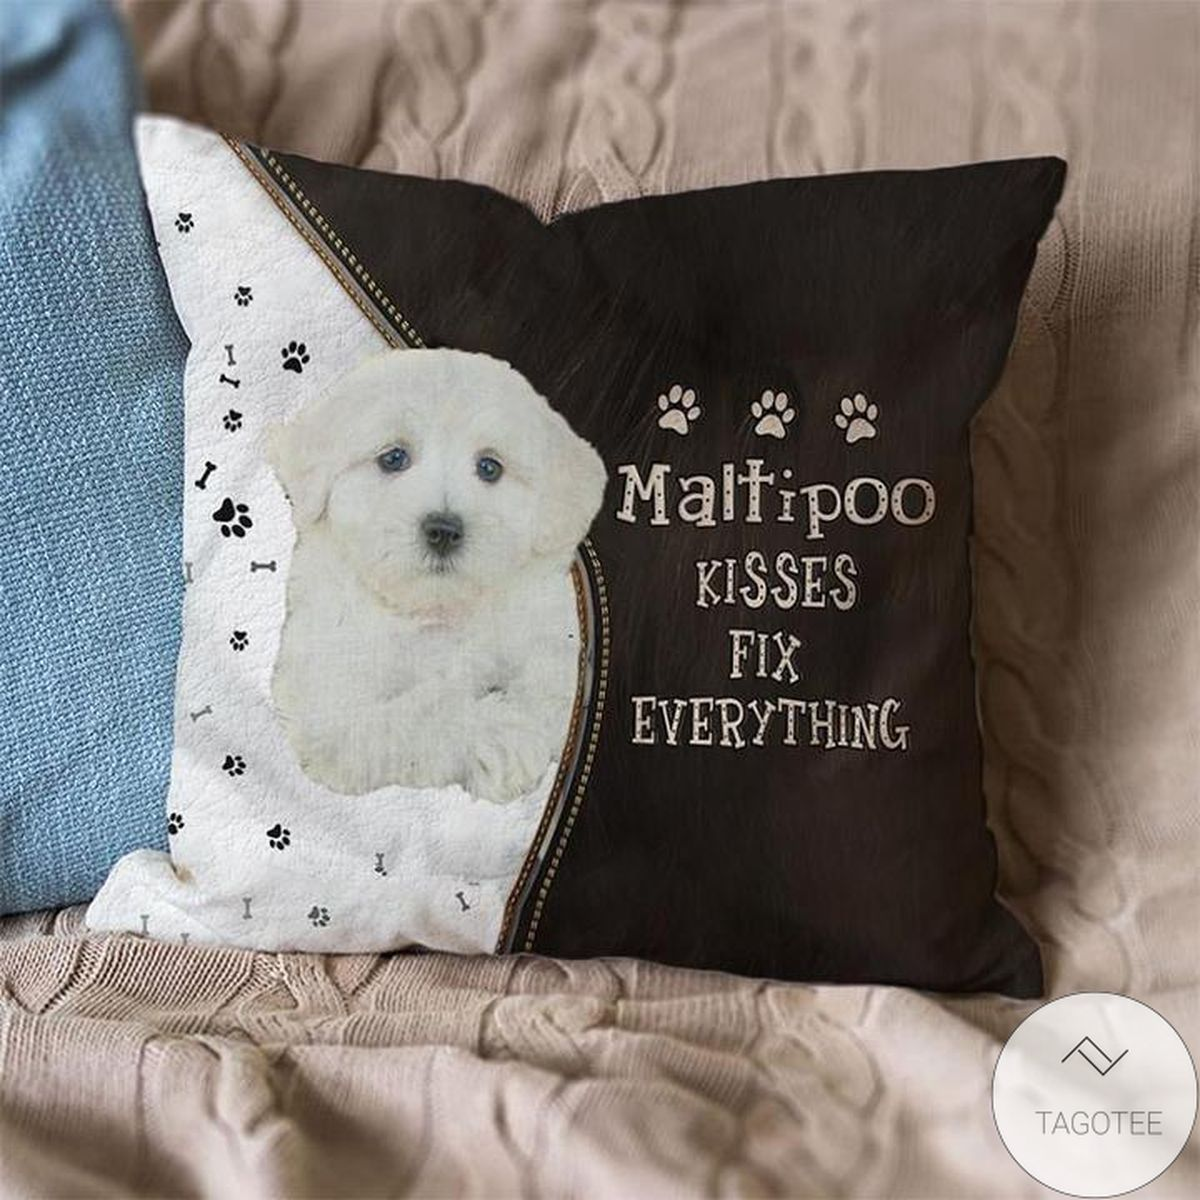 Maltipoo Kisses Fix Everything Pillowcase